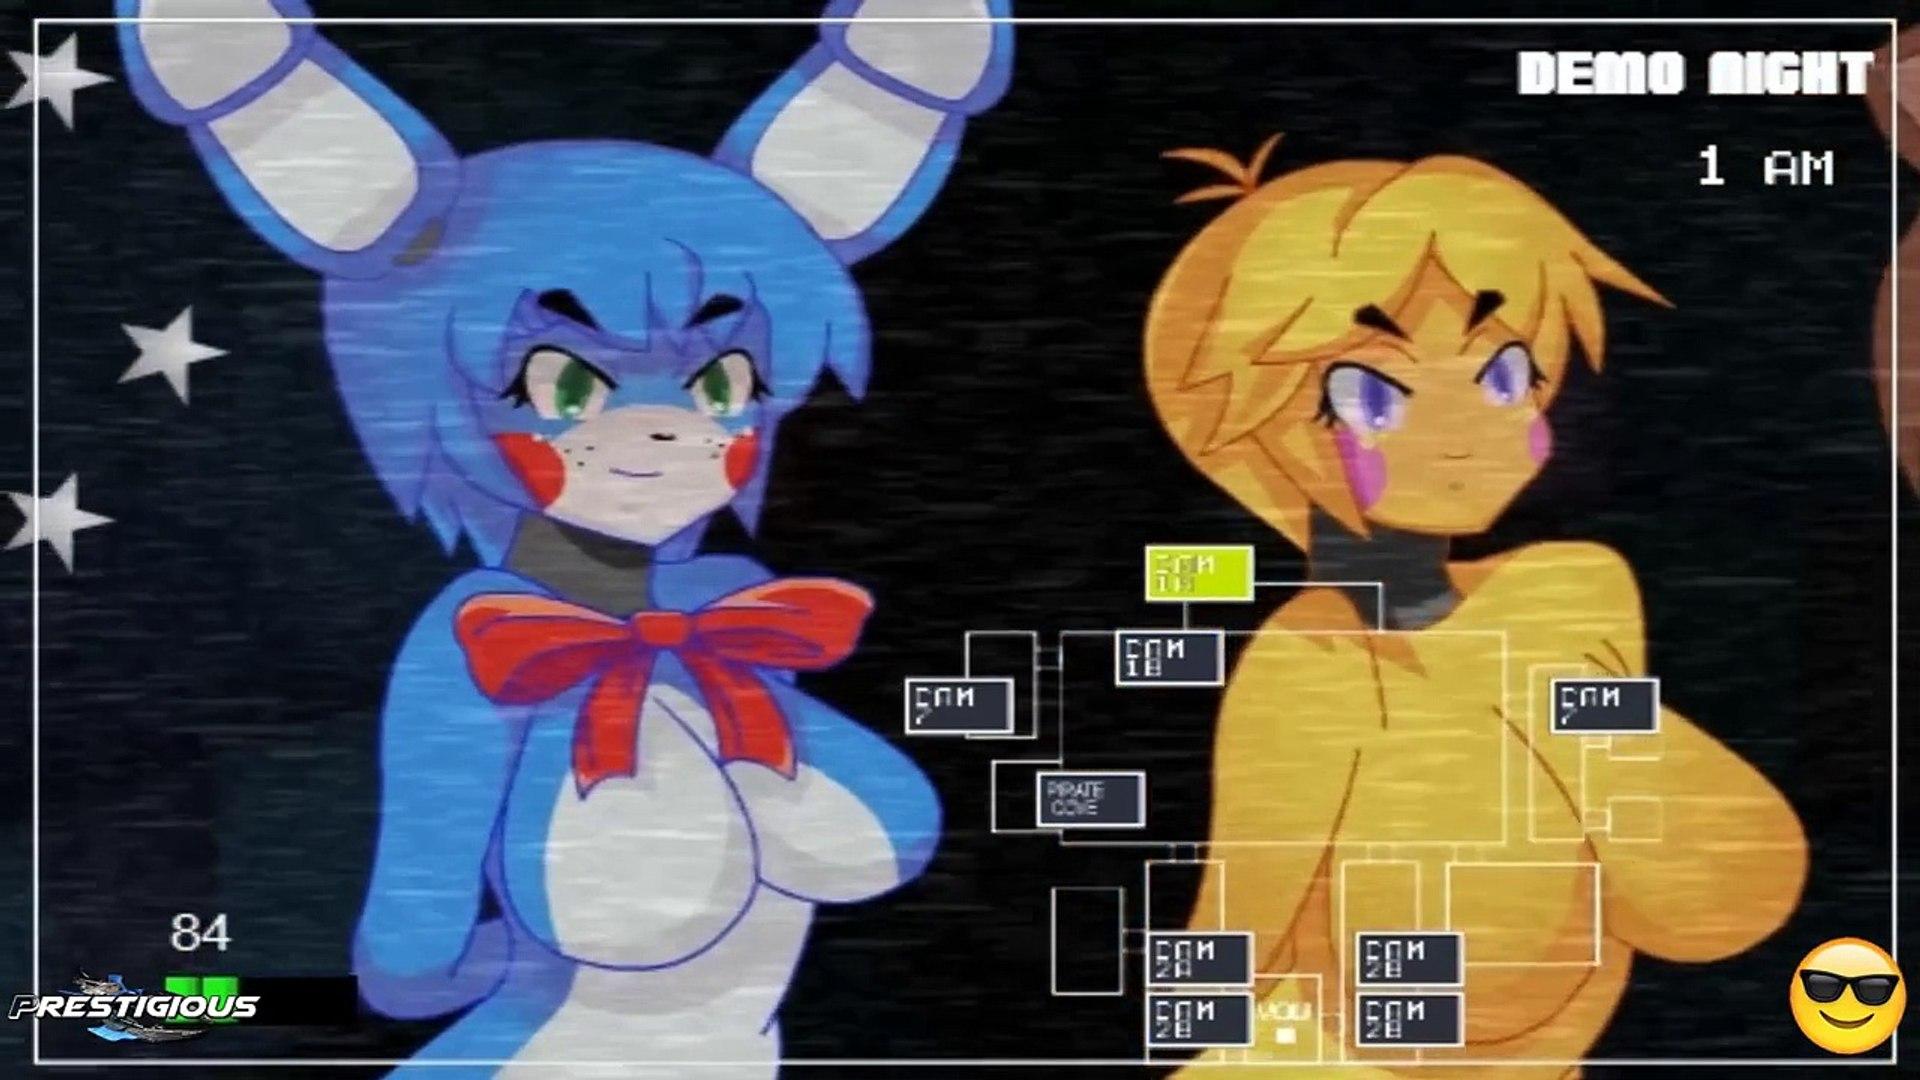 FIVE NIGHTS IN ANIME (Weird Games w/ Ross) BLCD - manga - DramaCD - Anime - Anime song - amv